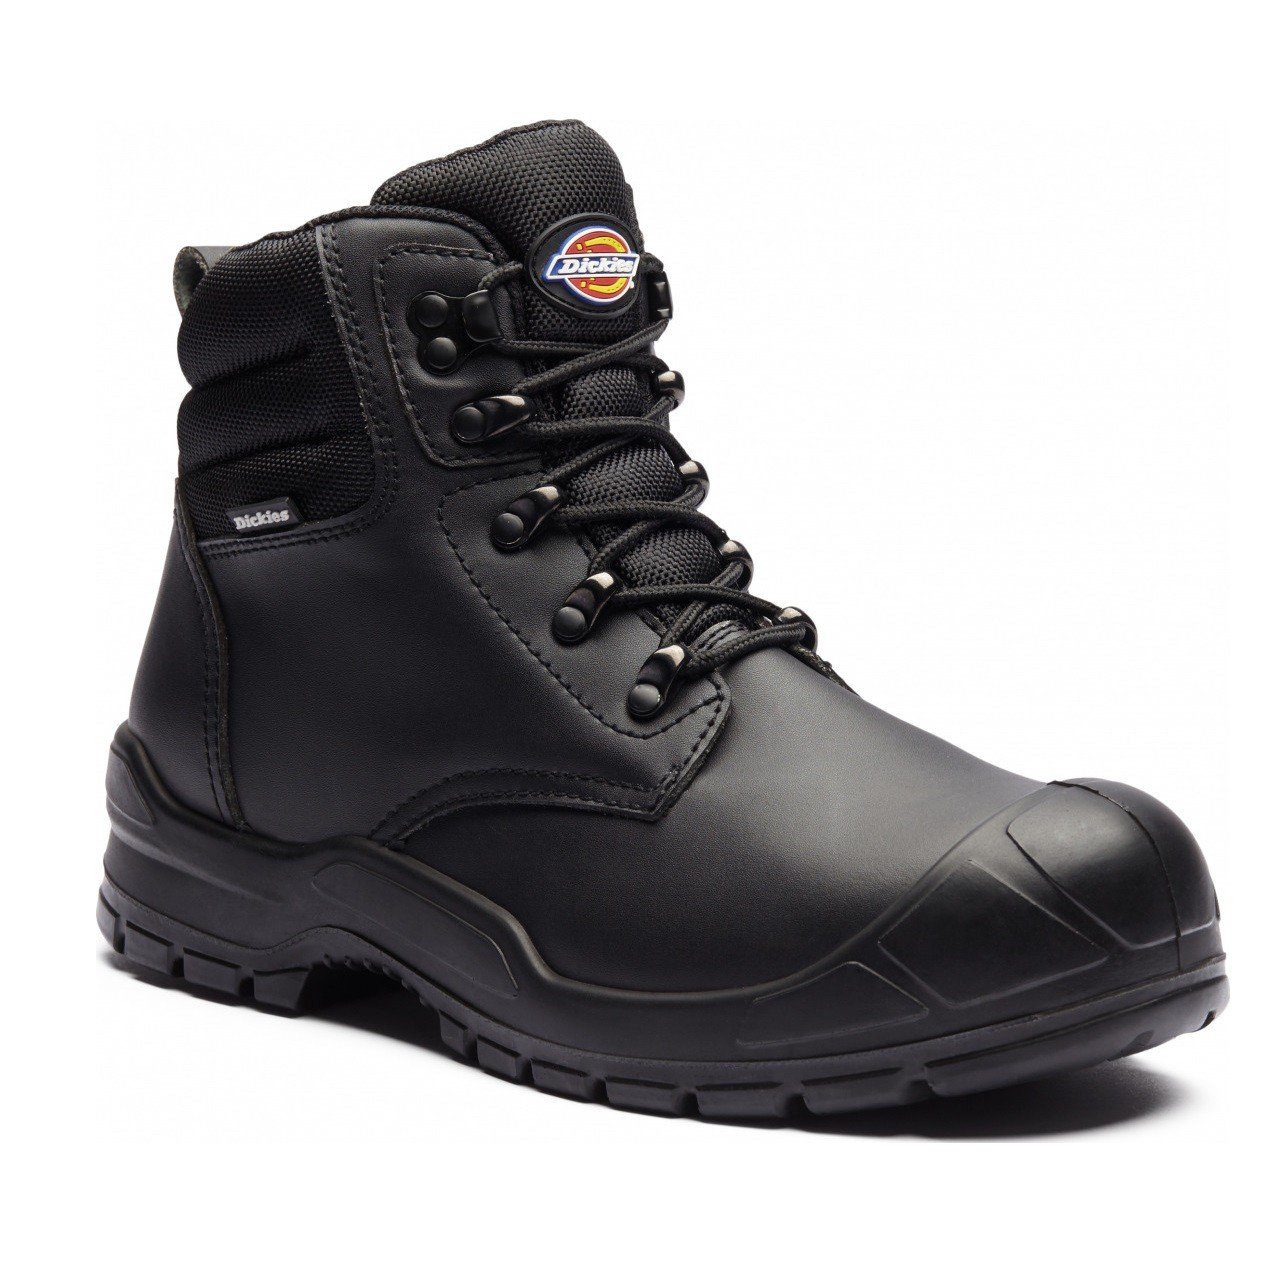 Chaussure de s curit montante dickies trenton safety boot s1p - Chaussure de securite montante ...